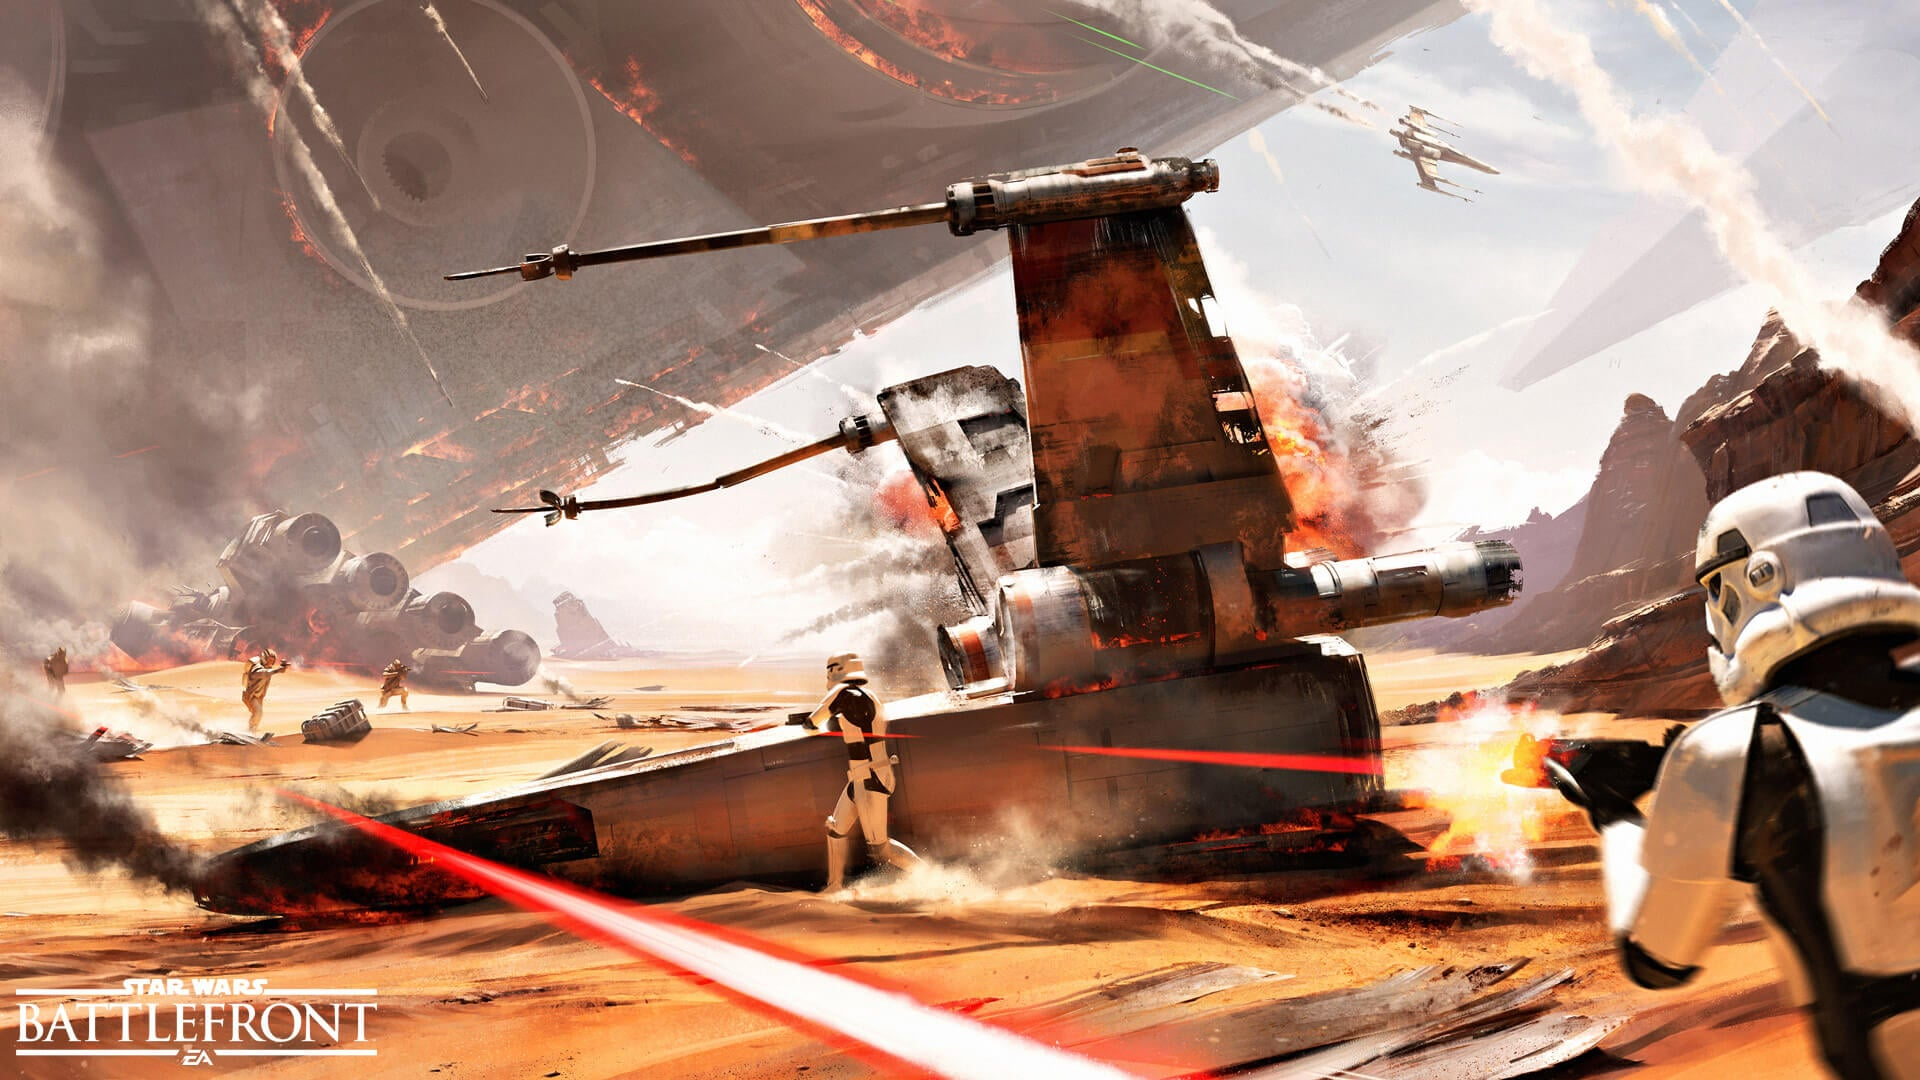 Star Wars Battlefront Battle Of Jaaku Dlc Details